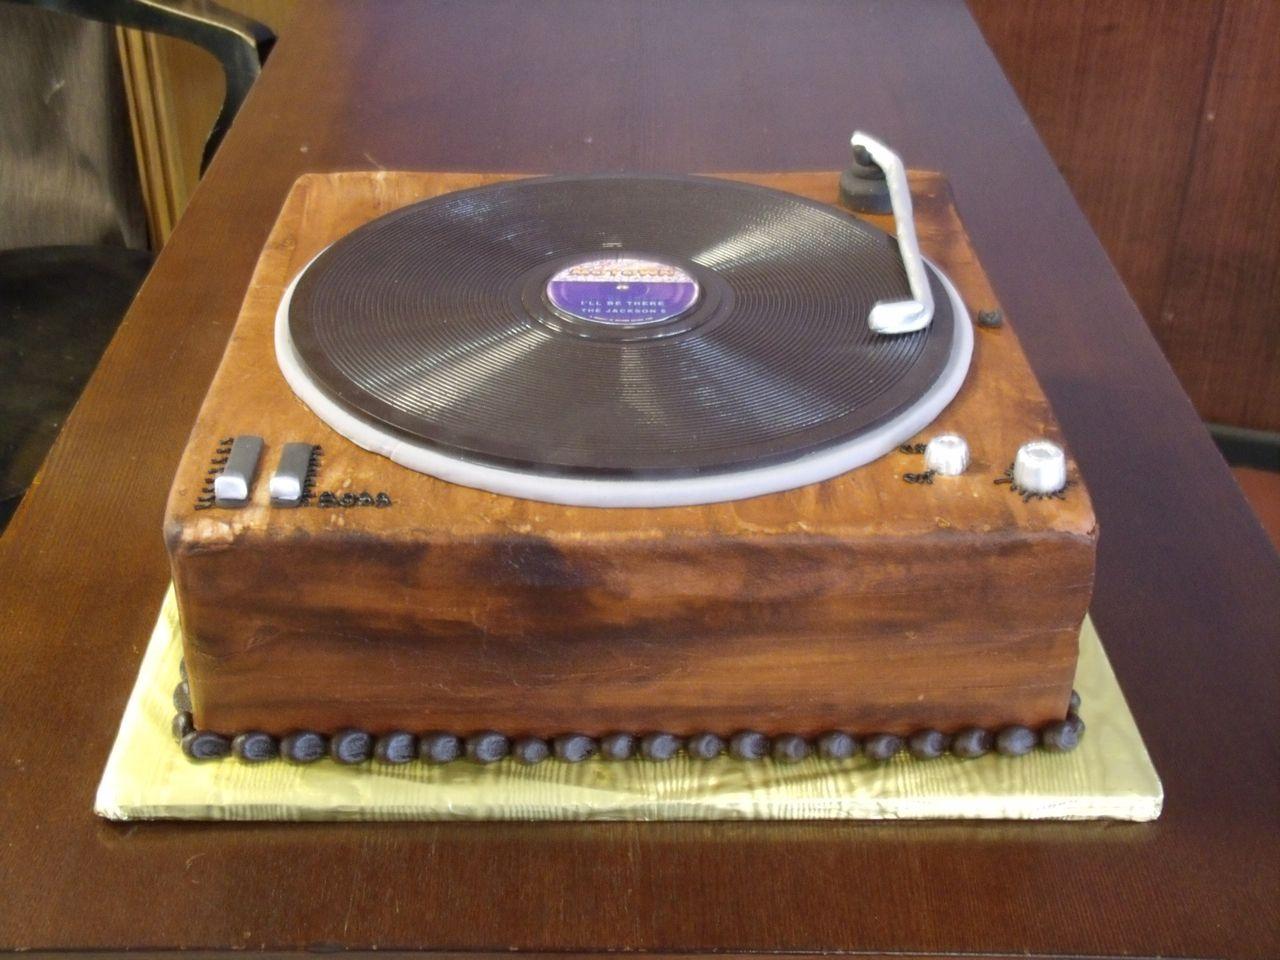 Retro Turntable Record Player Birthday Cake Unusual